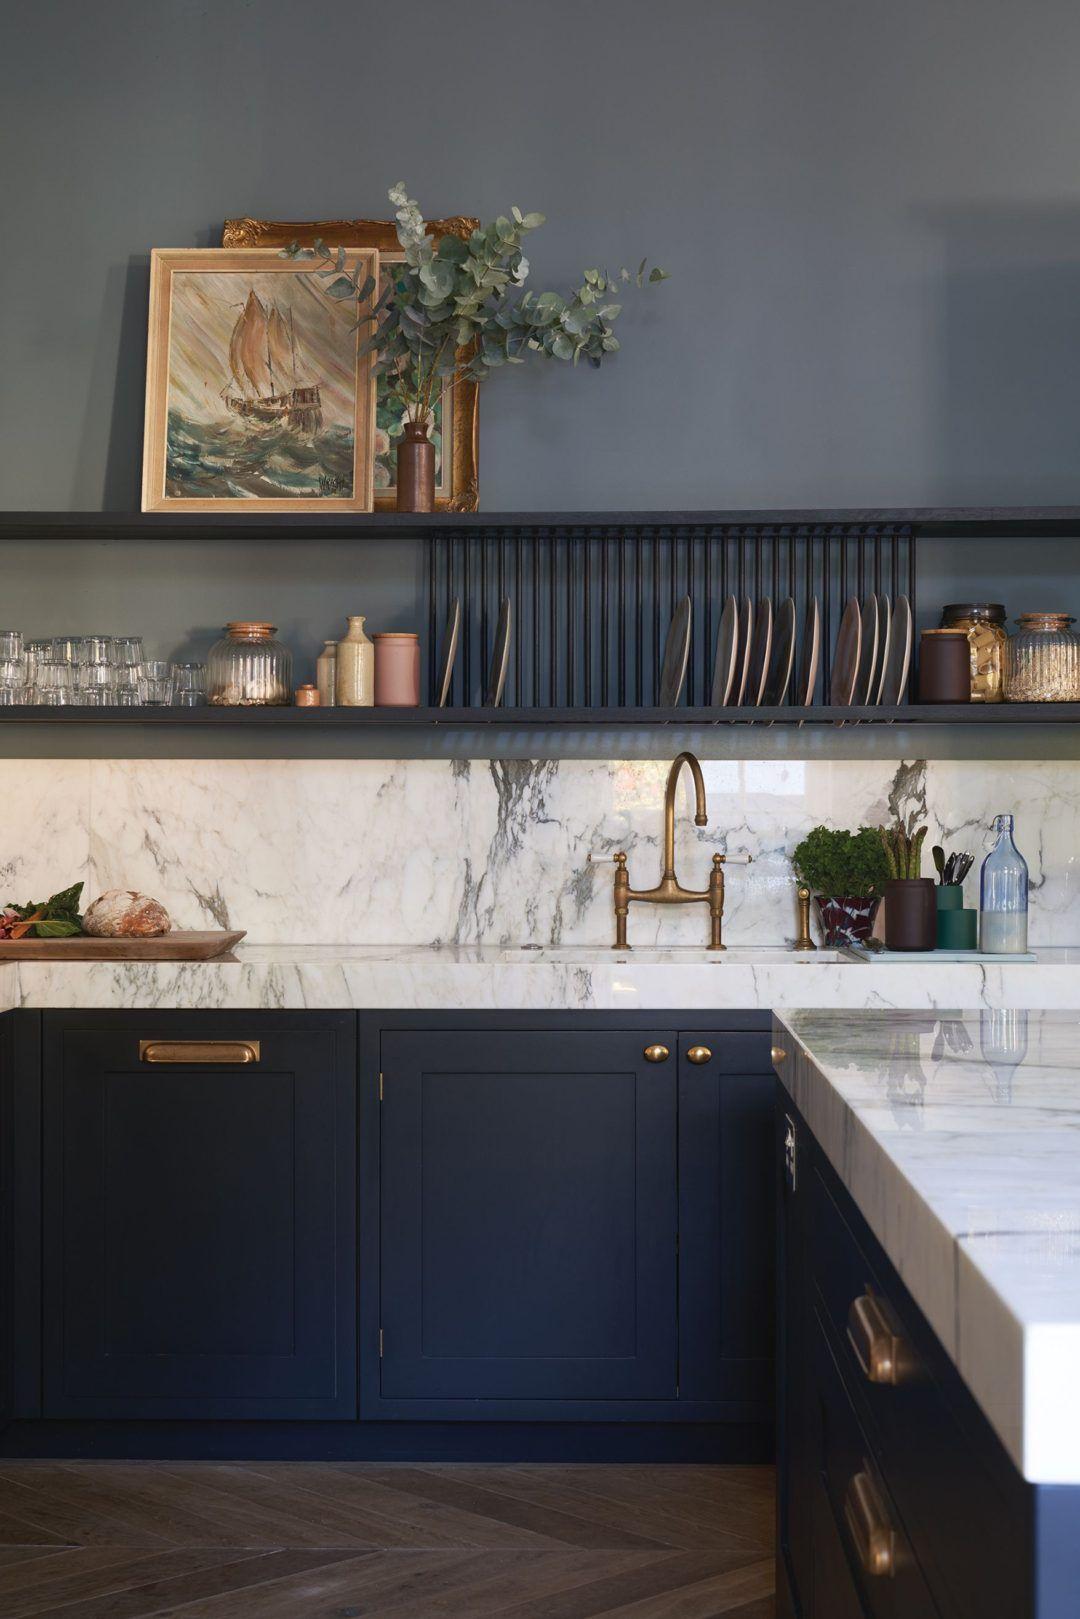 The Best Interior Design Trends For 2020 In 2020 Kitchen Design